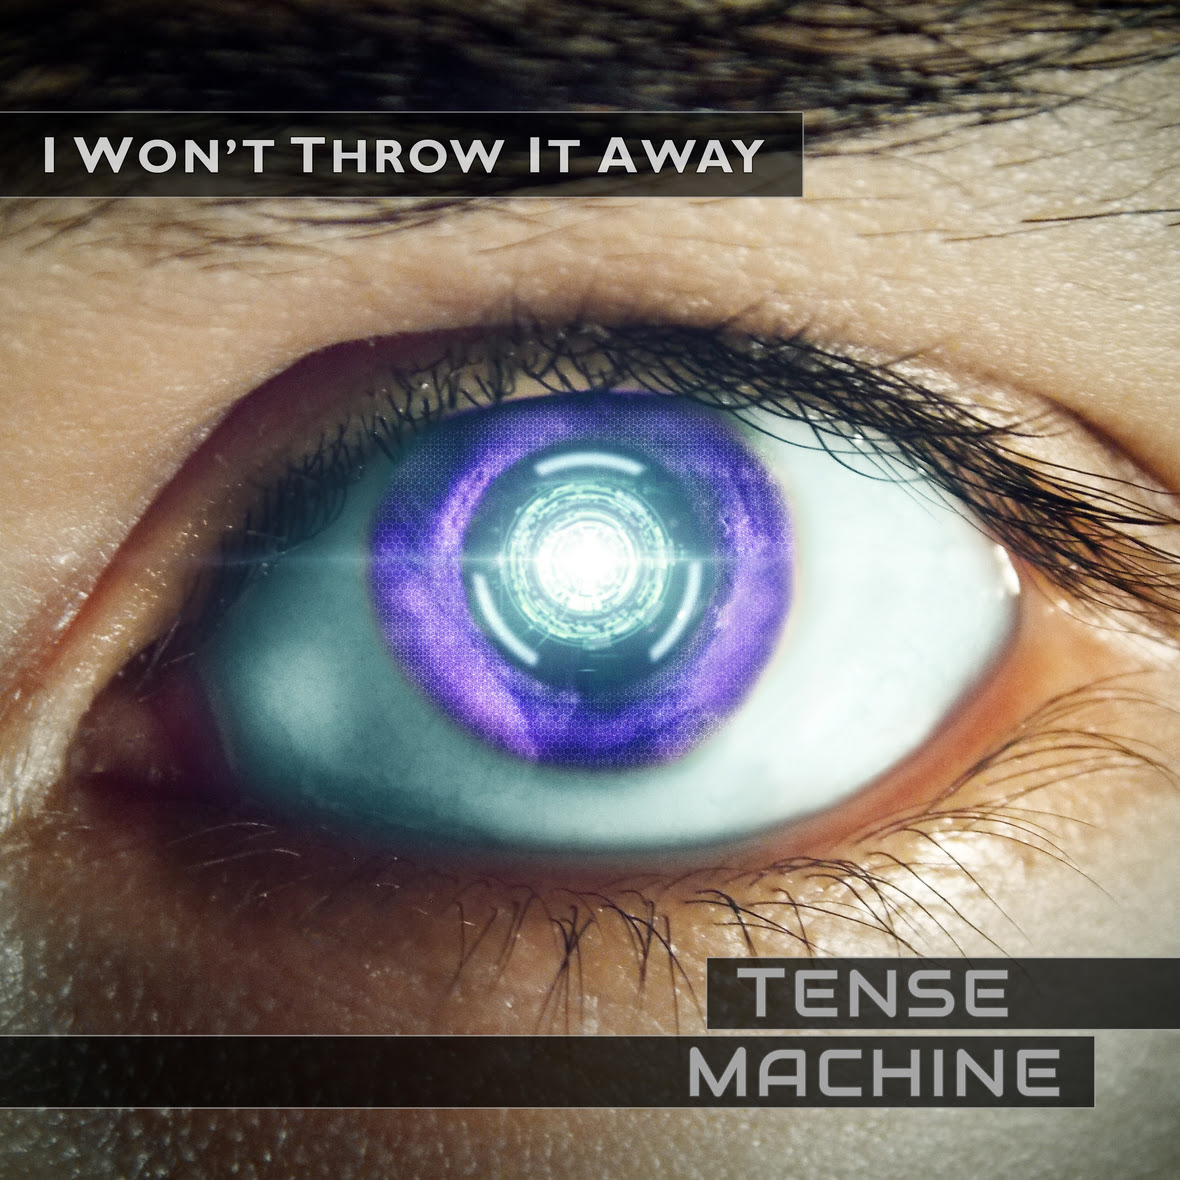 TenseMachine Artwork ThrowItAway 3000X3000